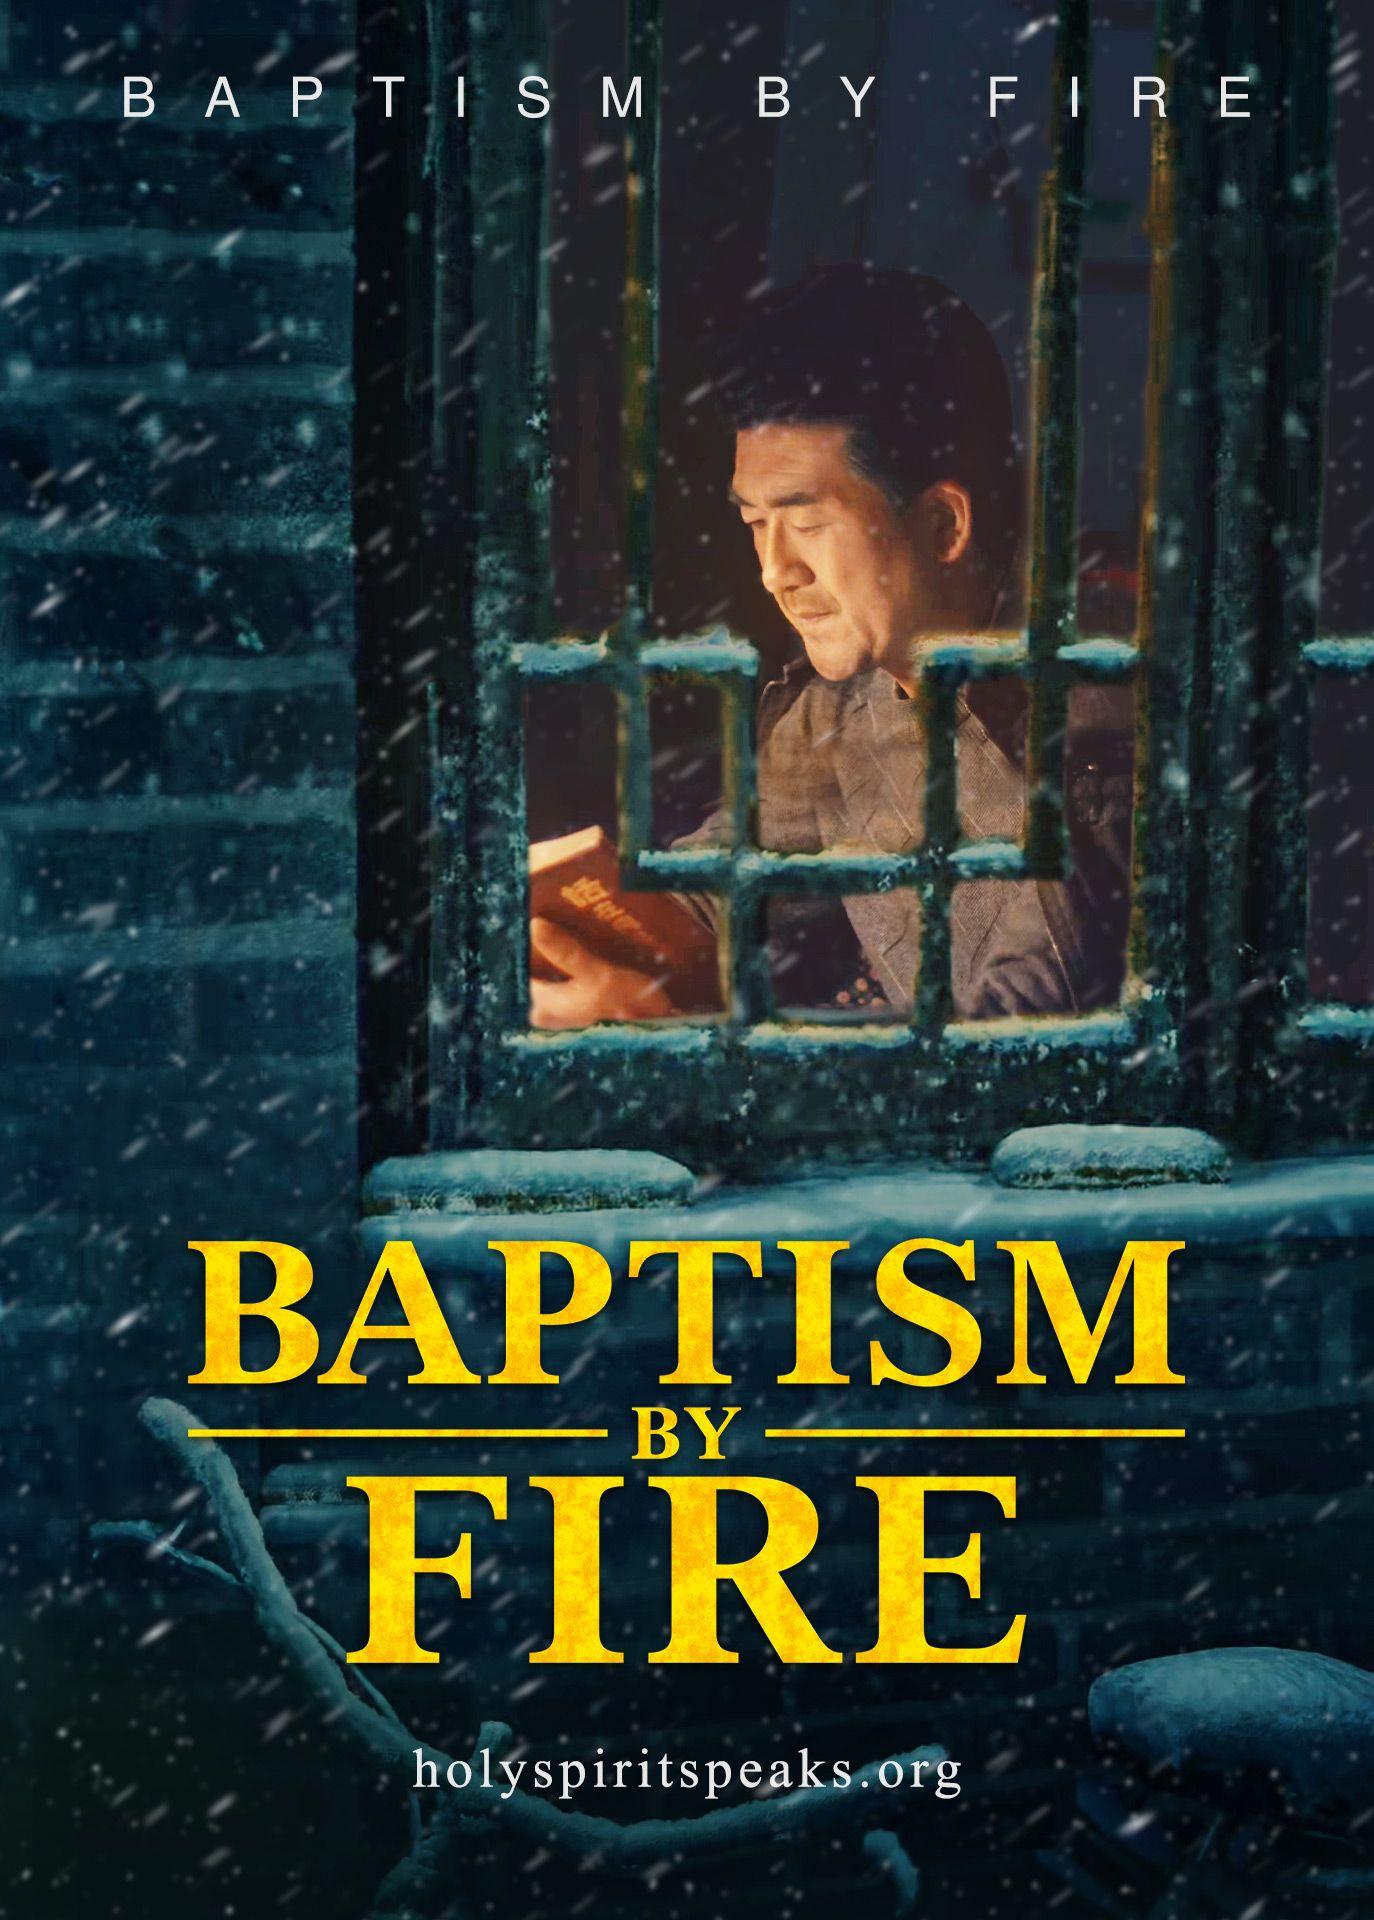 Baptism By Fire Voluntad De Dios Peliculas Cristianas Sabiduria De Dios